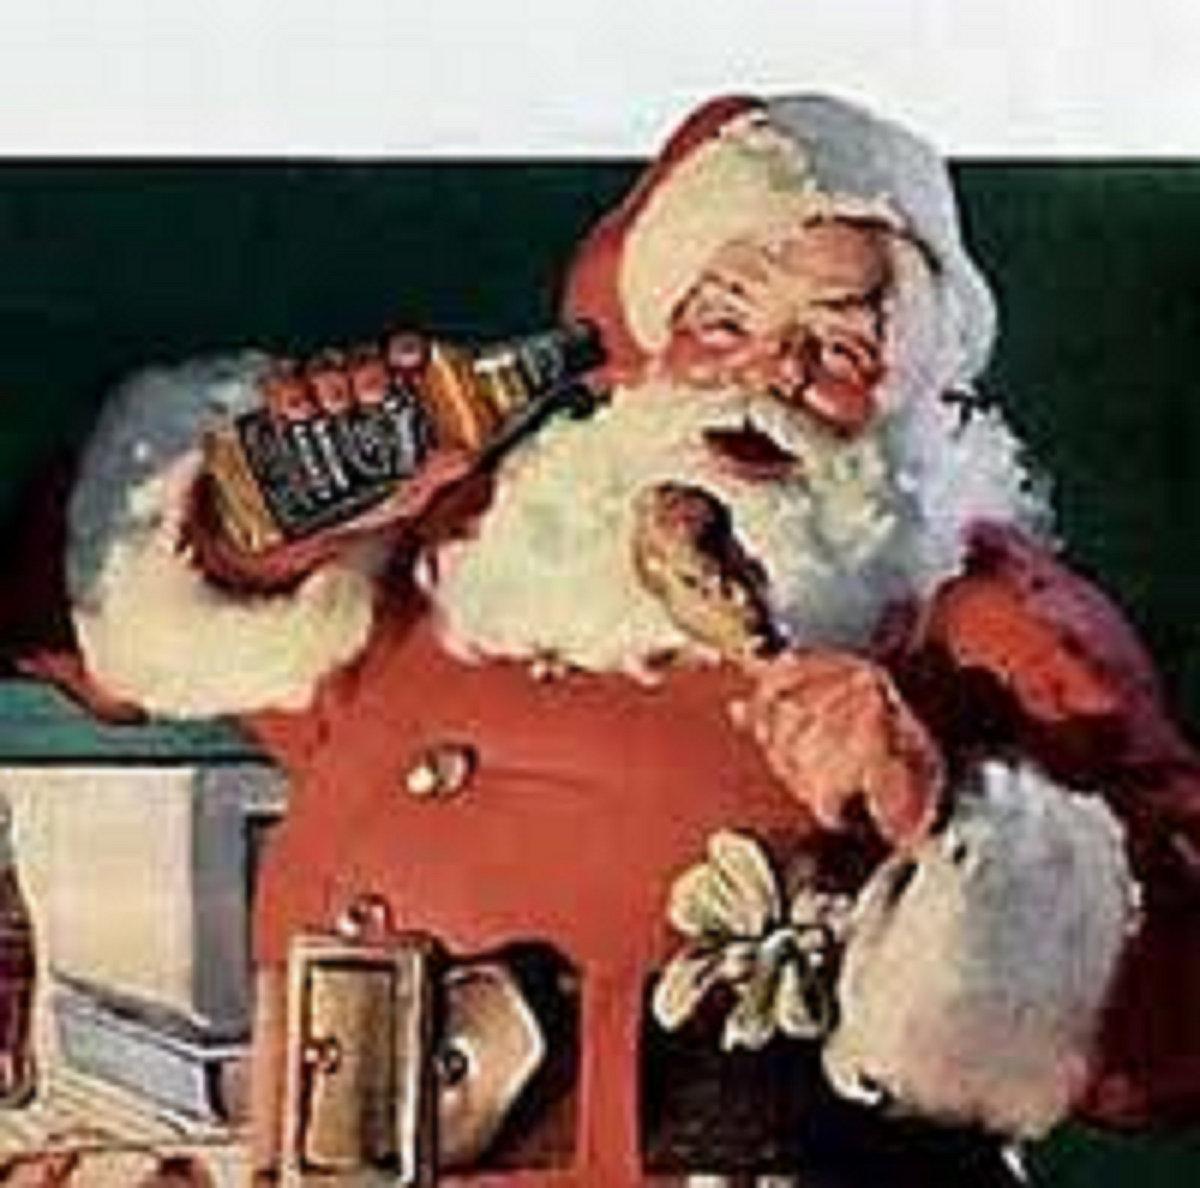 drunk for christmas - Drunk Christmas